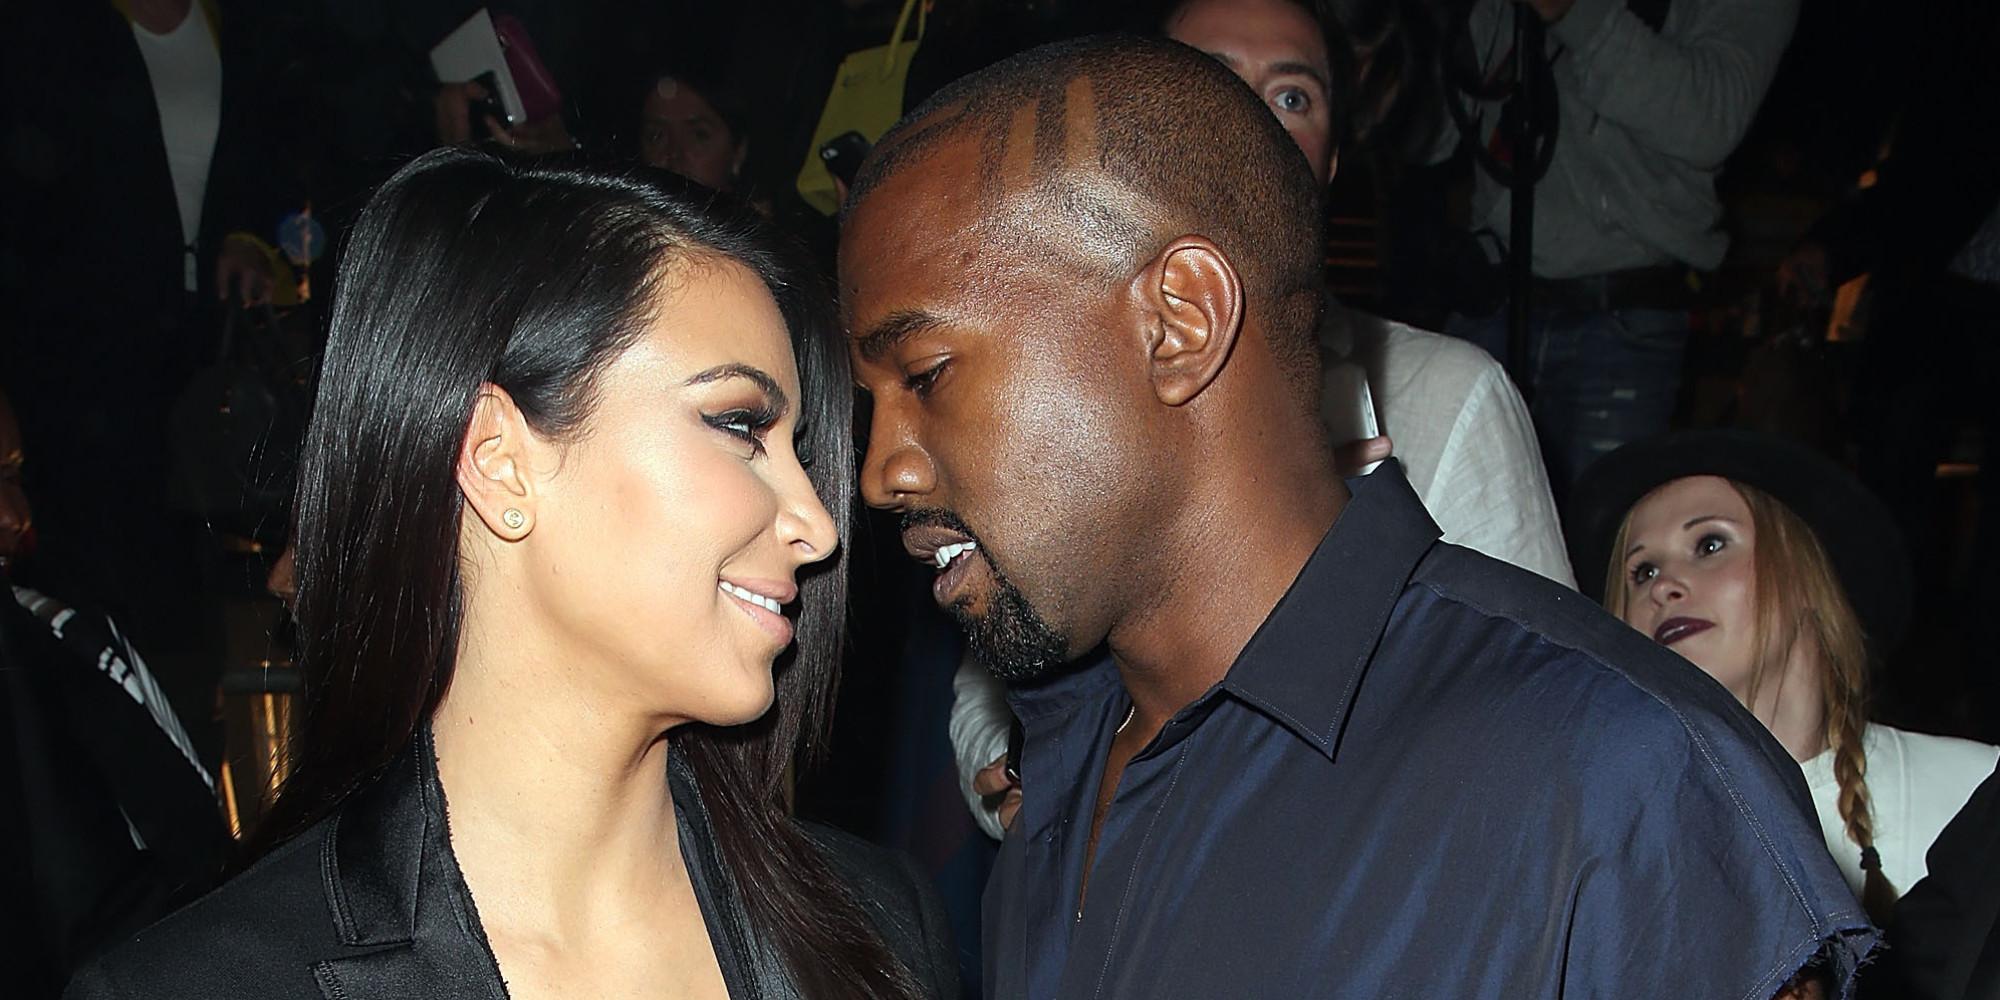 Possible kanye west and kim kardashian butt grab